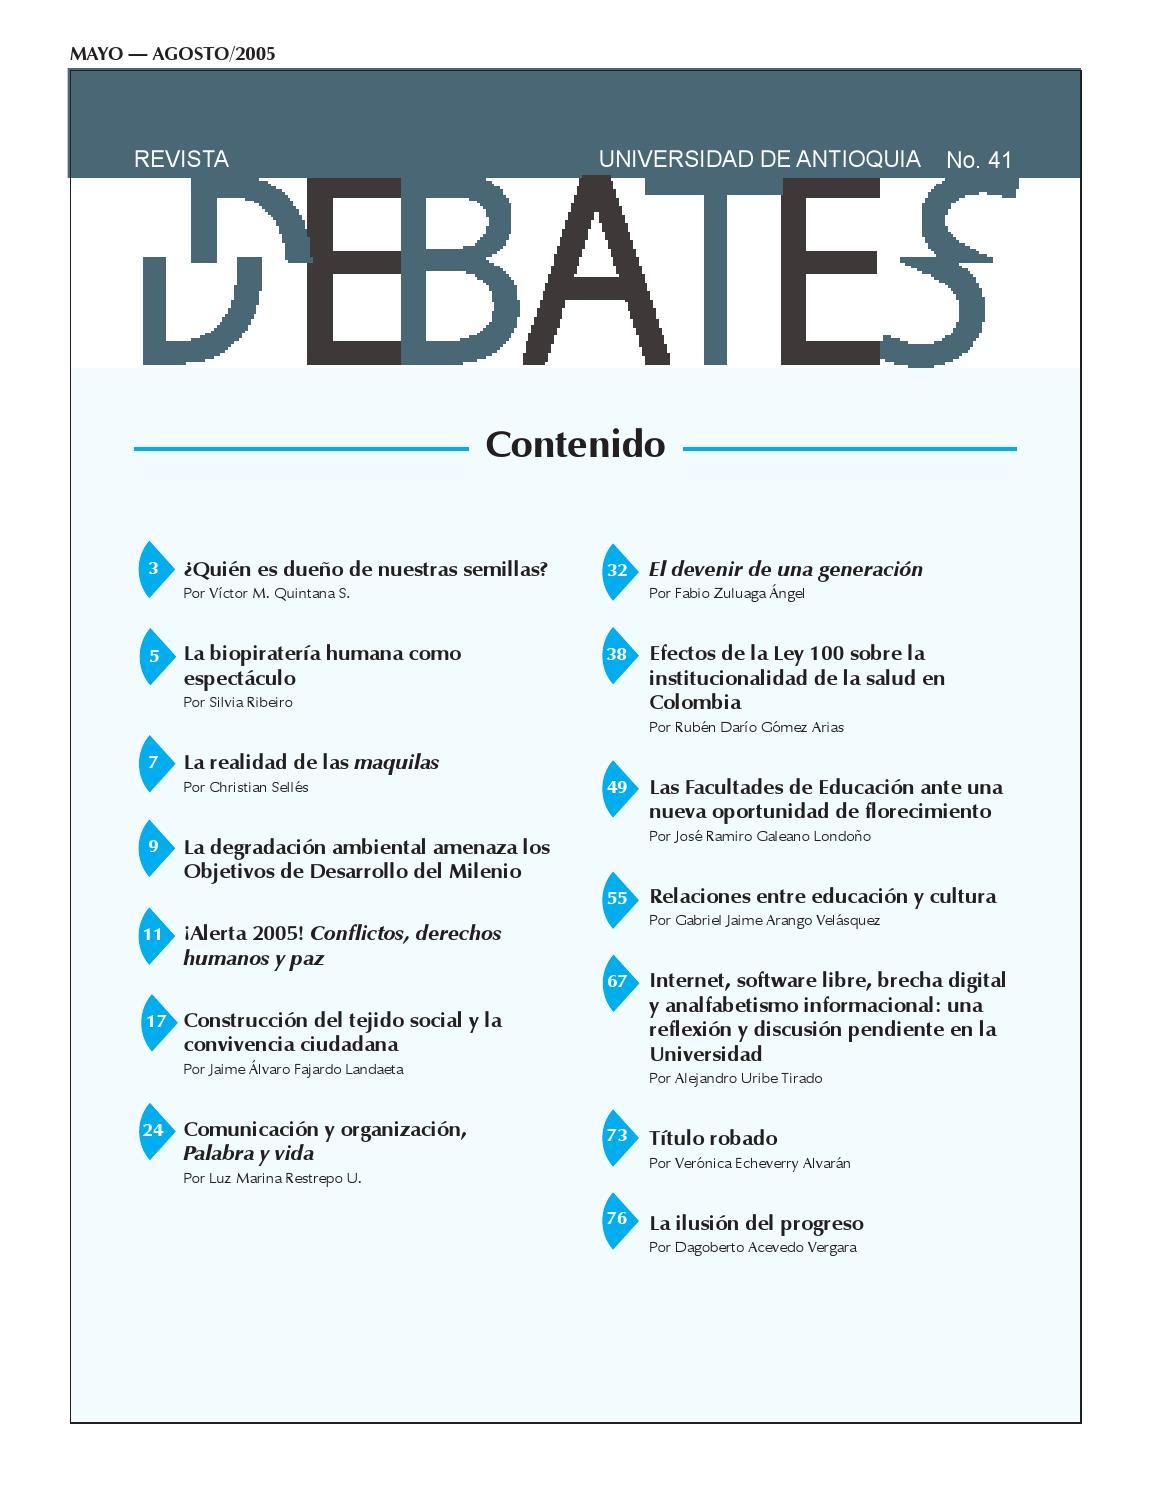 REVISTA DEBATES N° 41 by Universidad de Antioquia - issuu